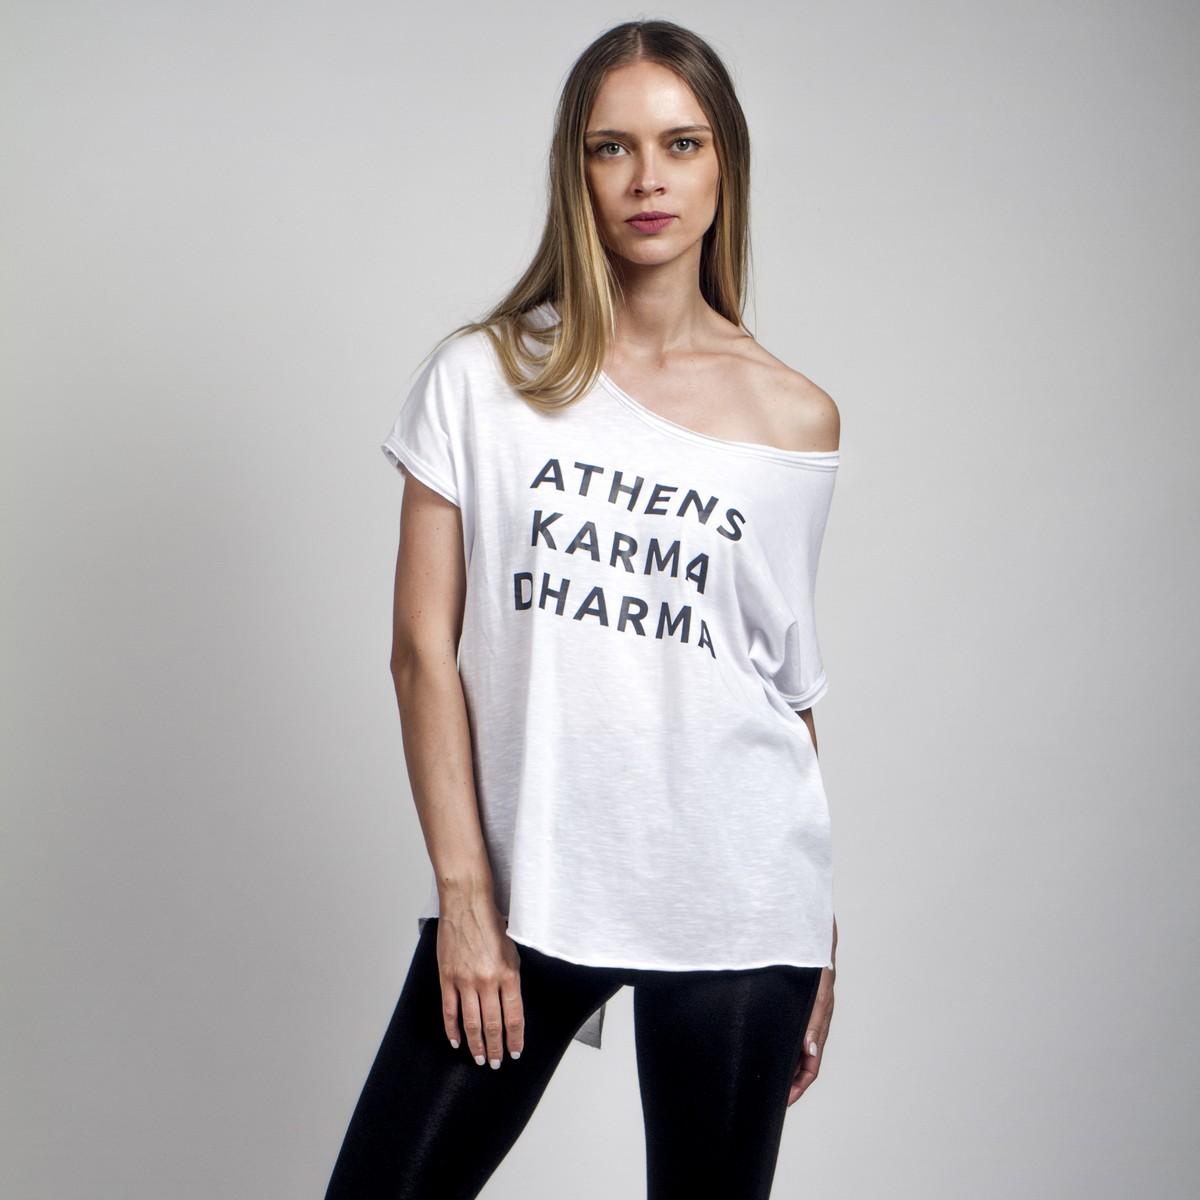 a5c4cd97f5ff Ασπρο tshirt με στάμπα - Γυναικεία Ρούχα - Φορέματα - Xanashop